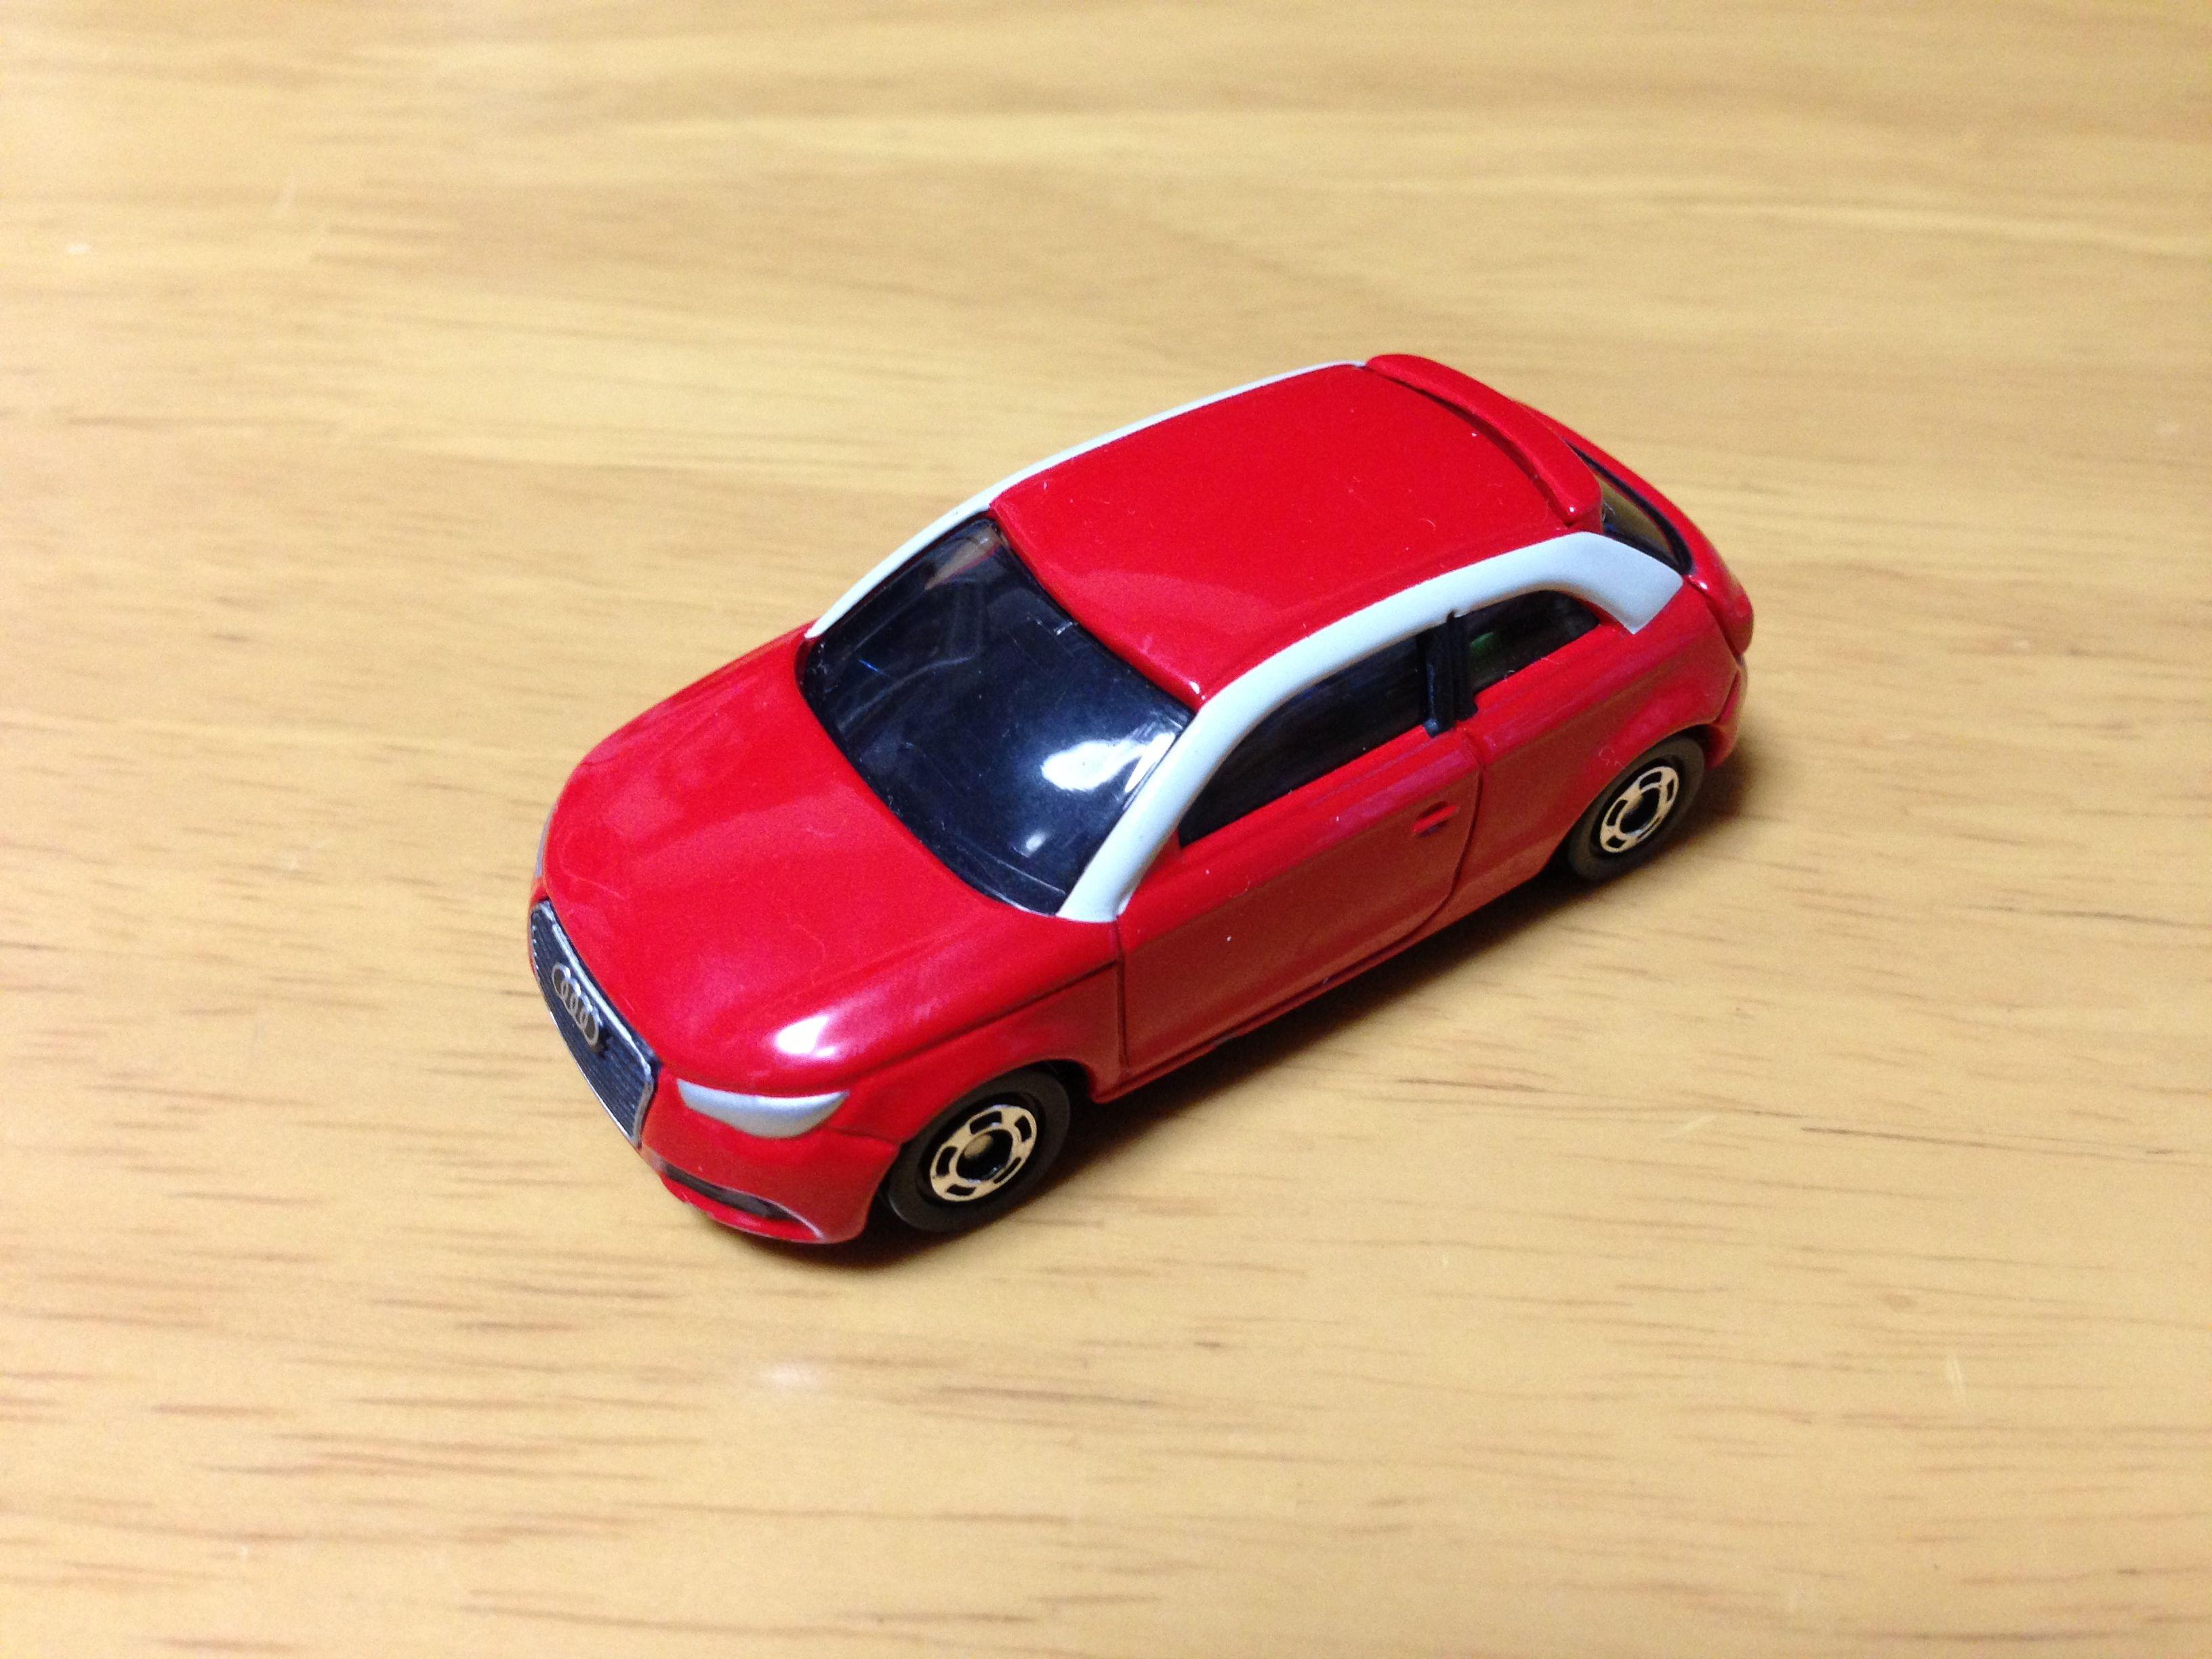 2012 Tomica No 111 S 1 60 Audi A1 Audi A1